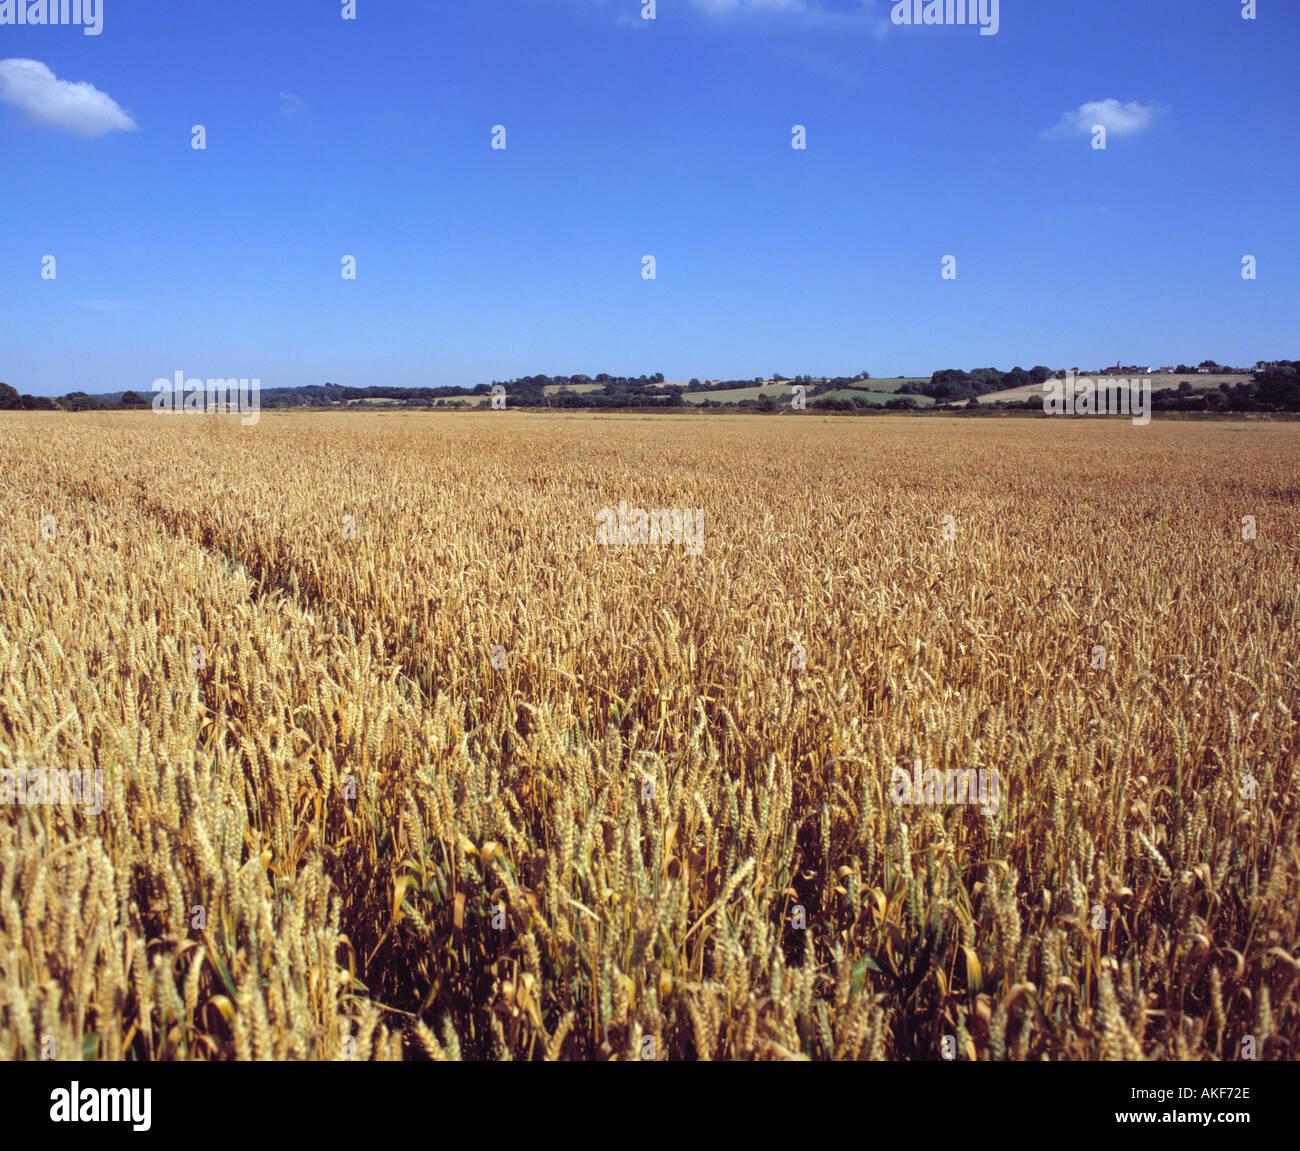 Fields / Crops, Corn - Stock Image